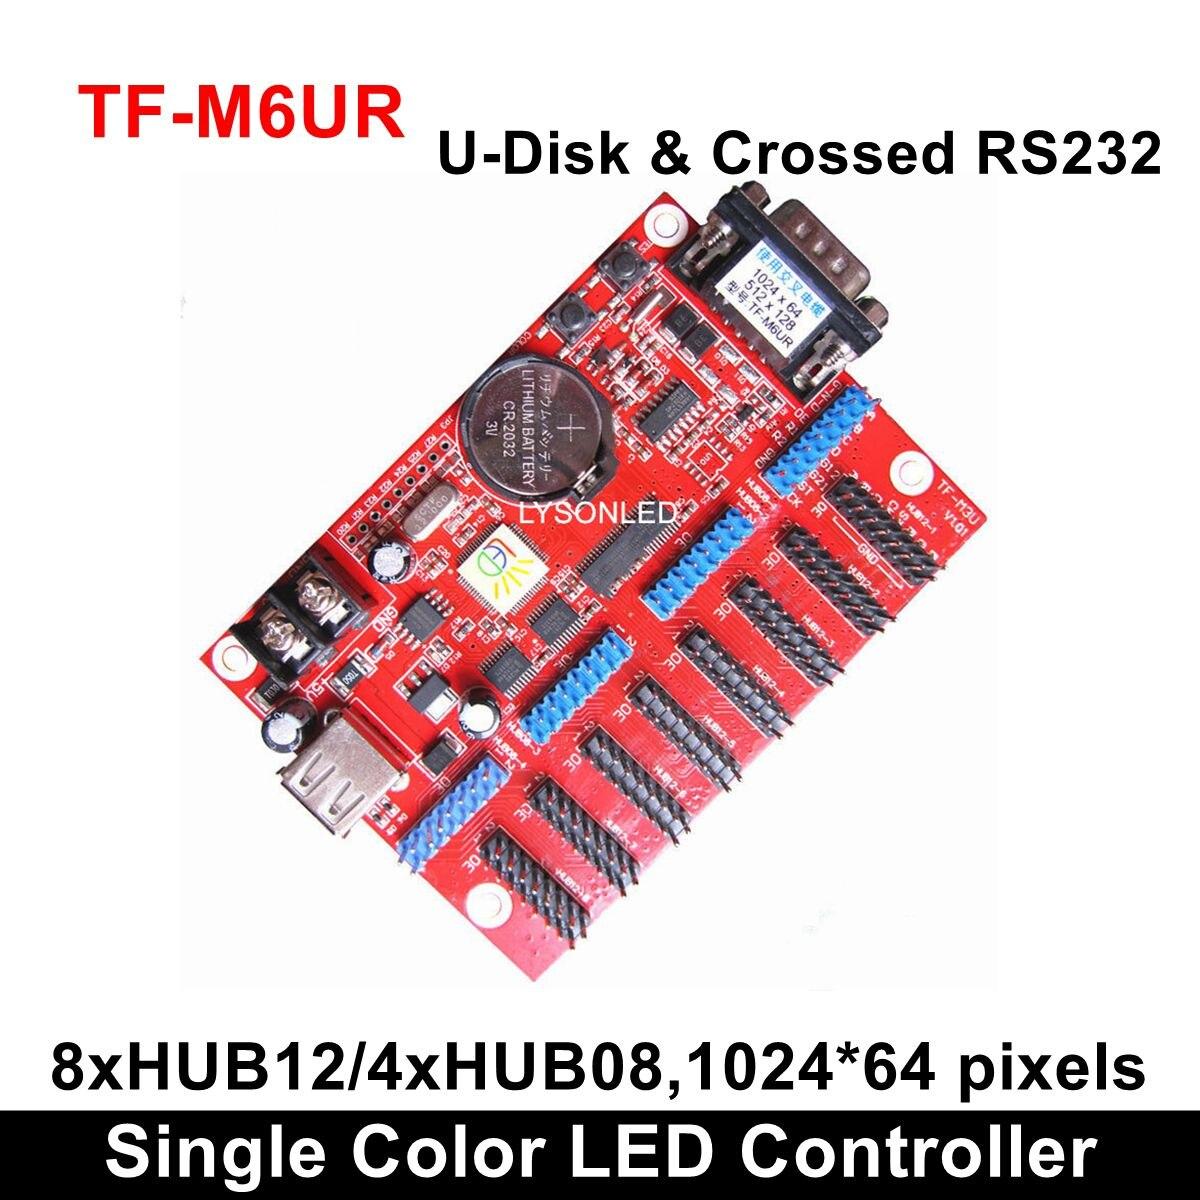 TF-MU TF-C6UR TF-M6UR Large USB Driver Port Single Color LED Card Control P4.75/P7.62/P10 Monochrome/Dual LED Matrix Module